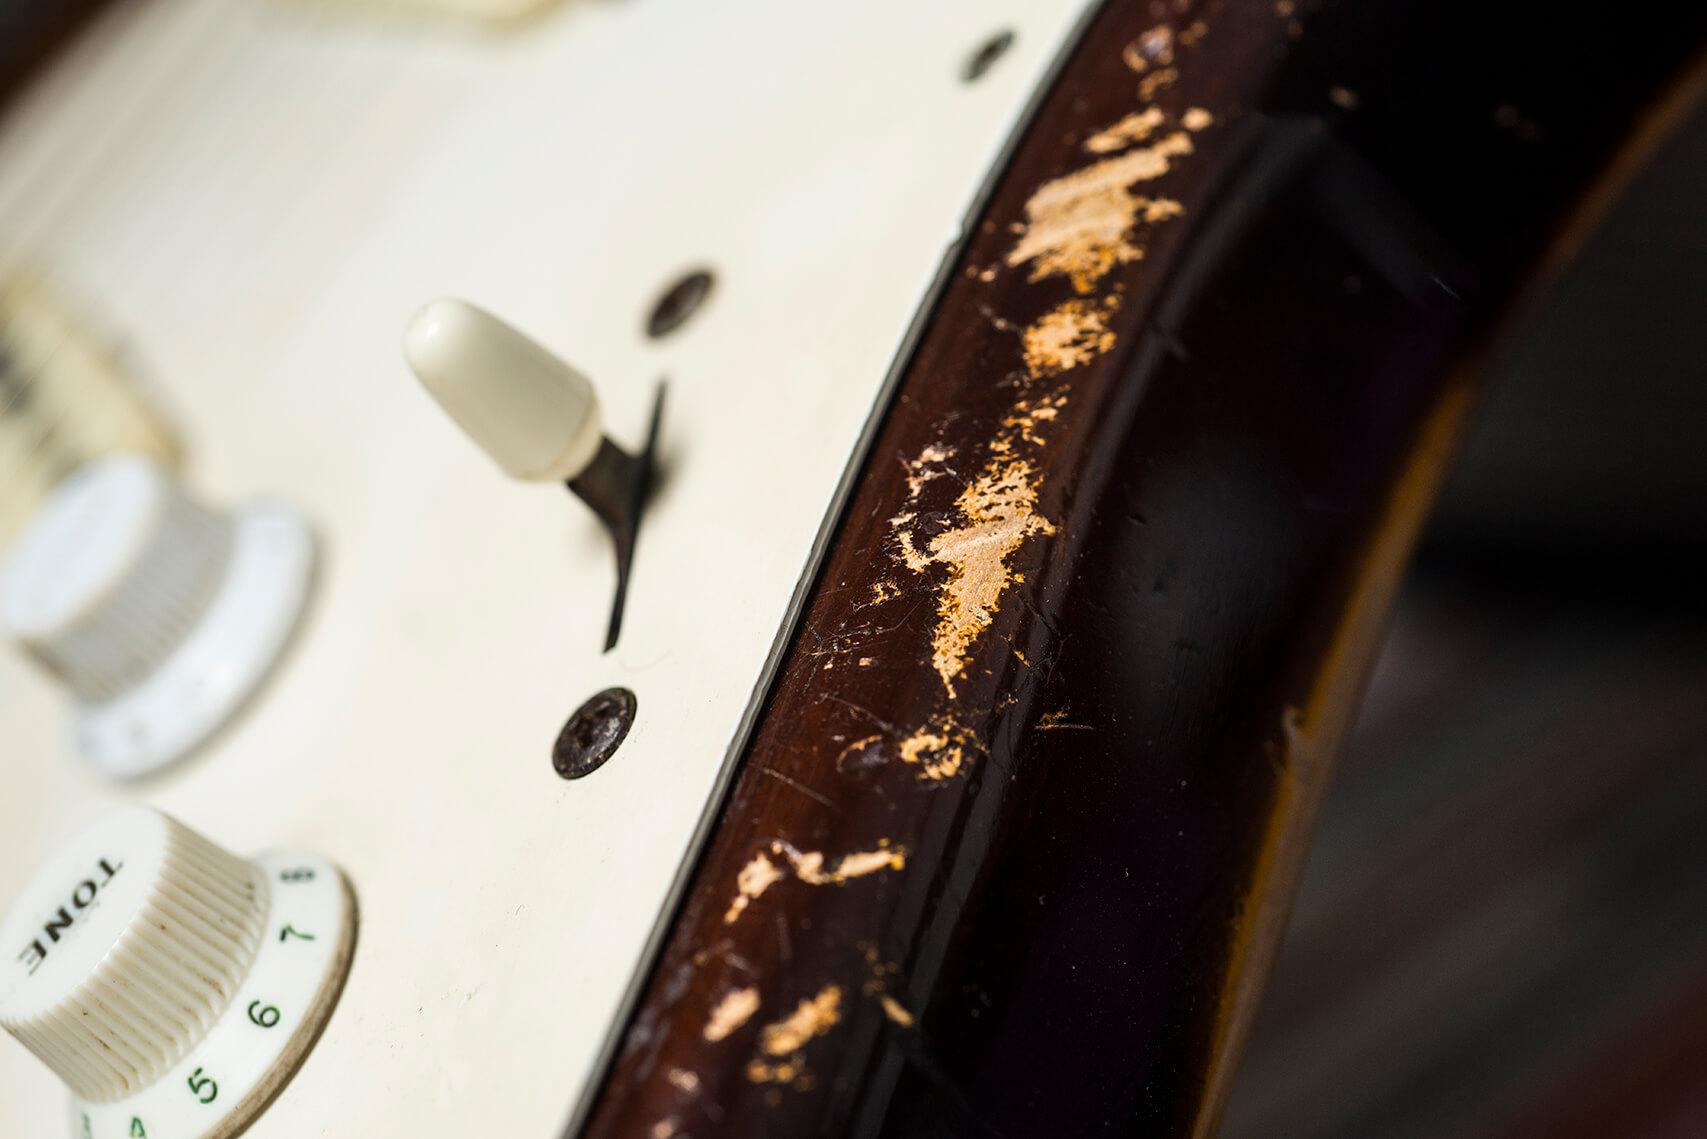 Jeff Garlin's 1955 Hardtail Sunburst Stratocaster Switch